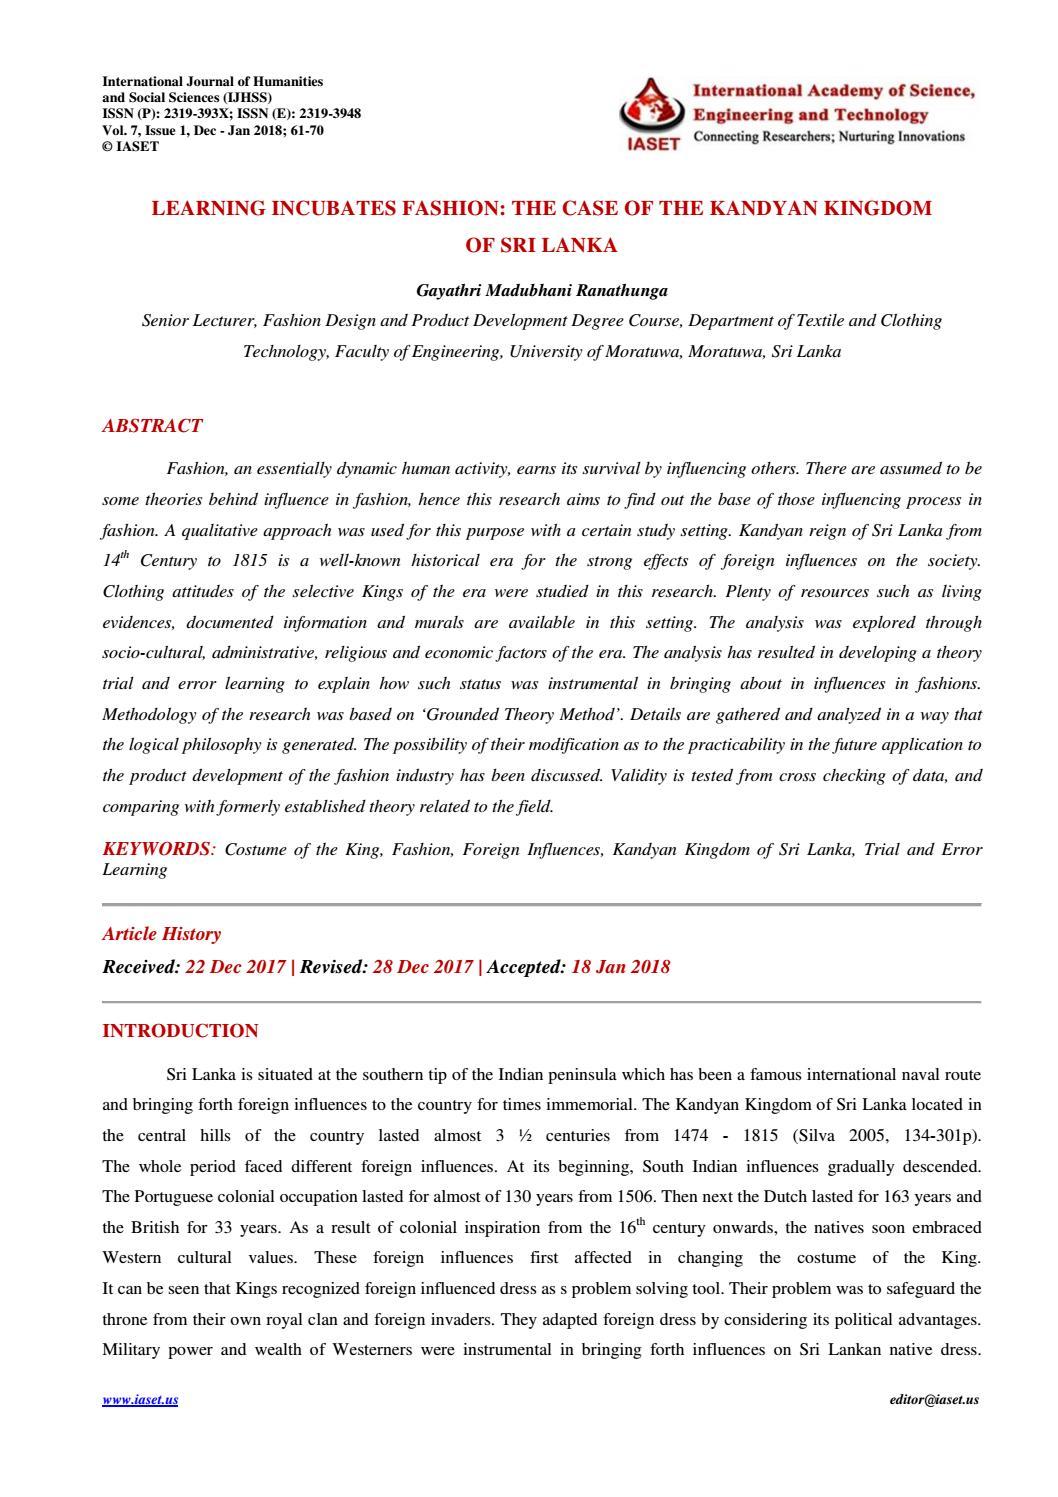 7 Ijhss Learning Incubates Fashion The Case Of The Kandyan Kingdom Of Sri Lanka By Iaset Journals Issuu